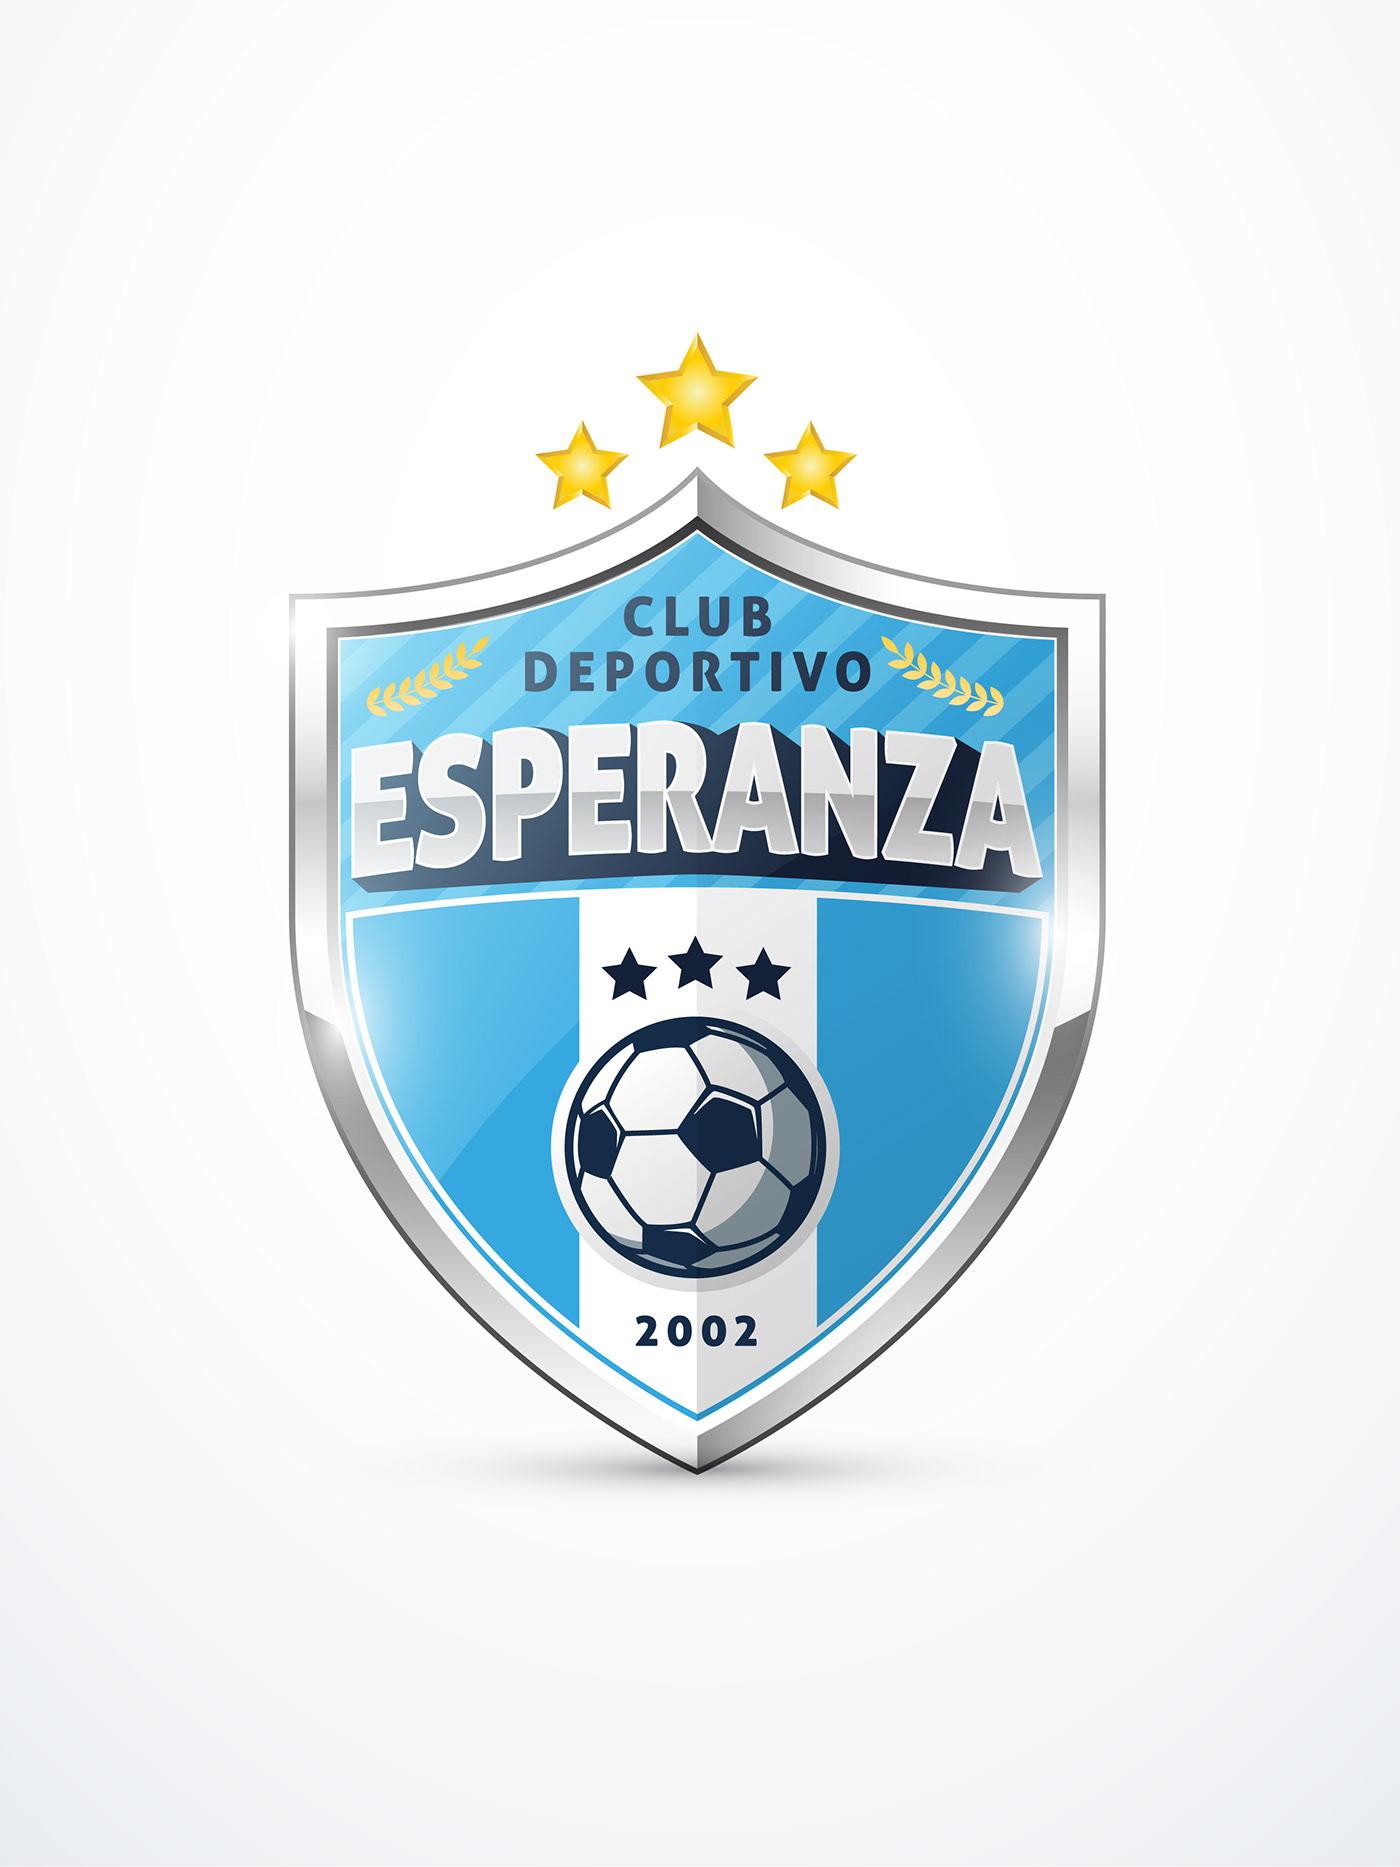 Image may contain: soccer and logo